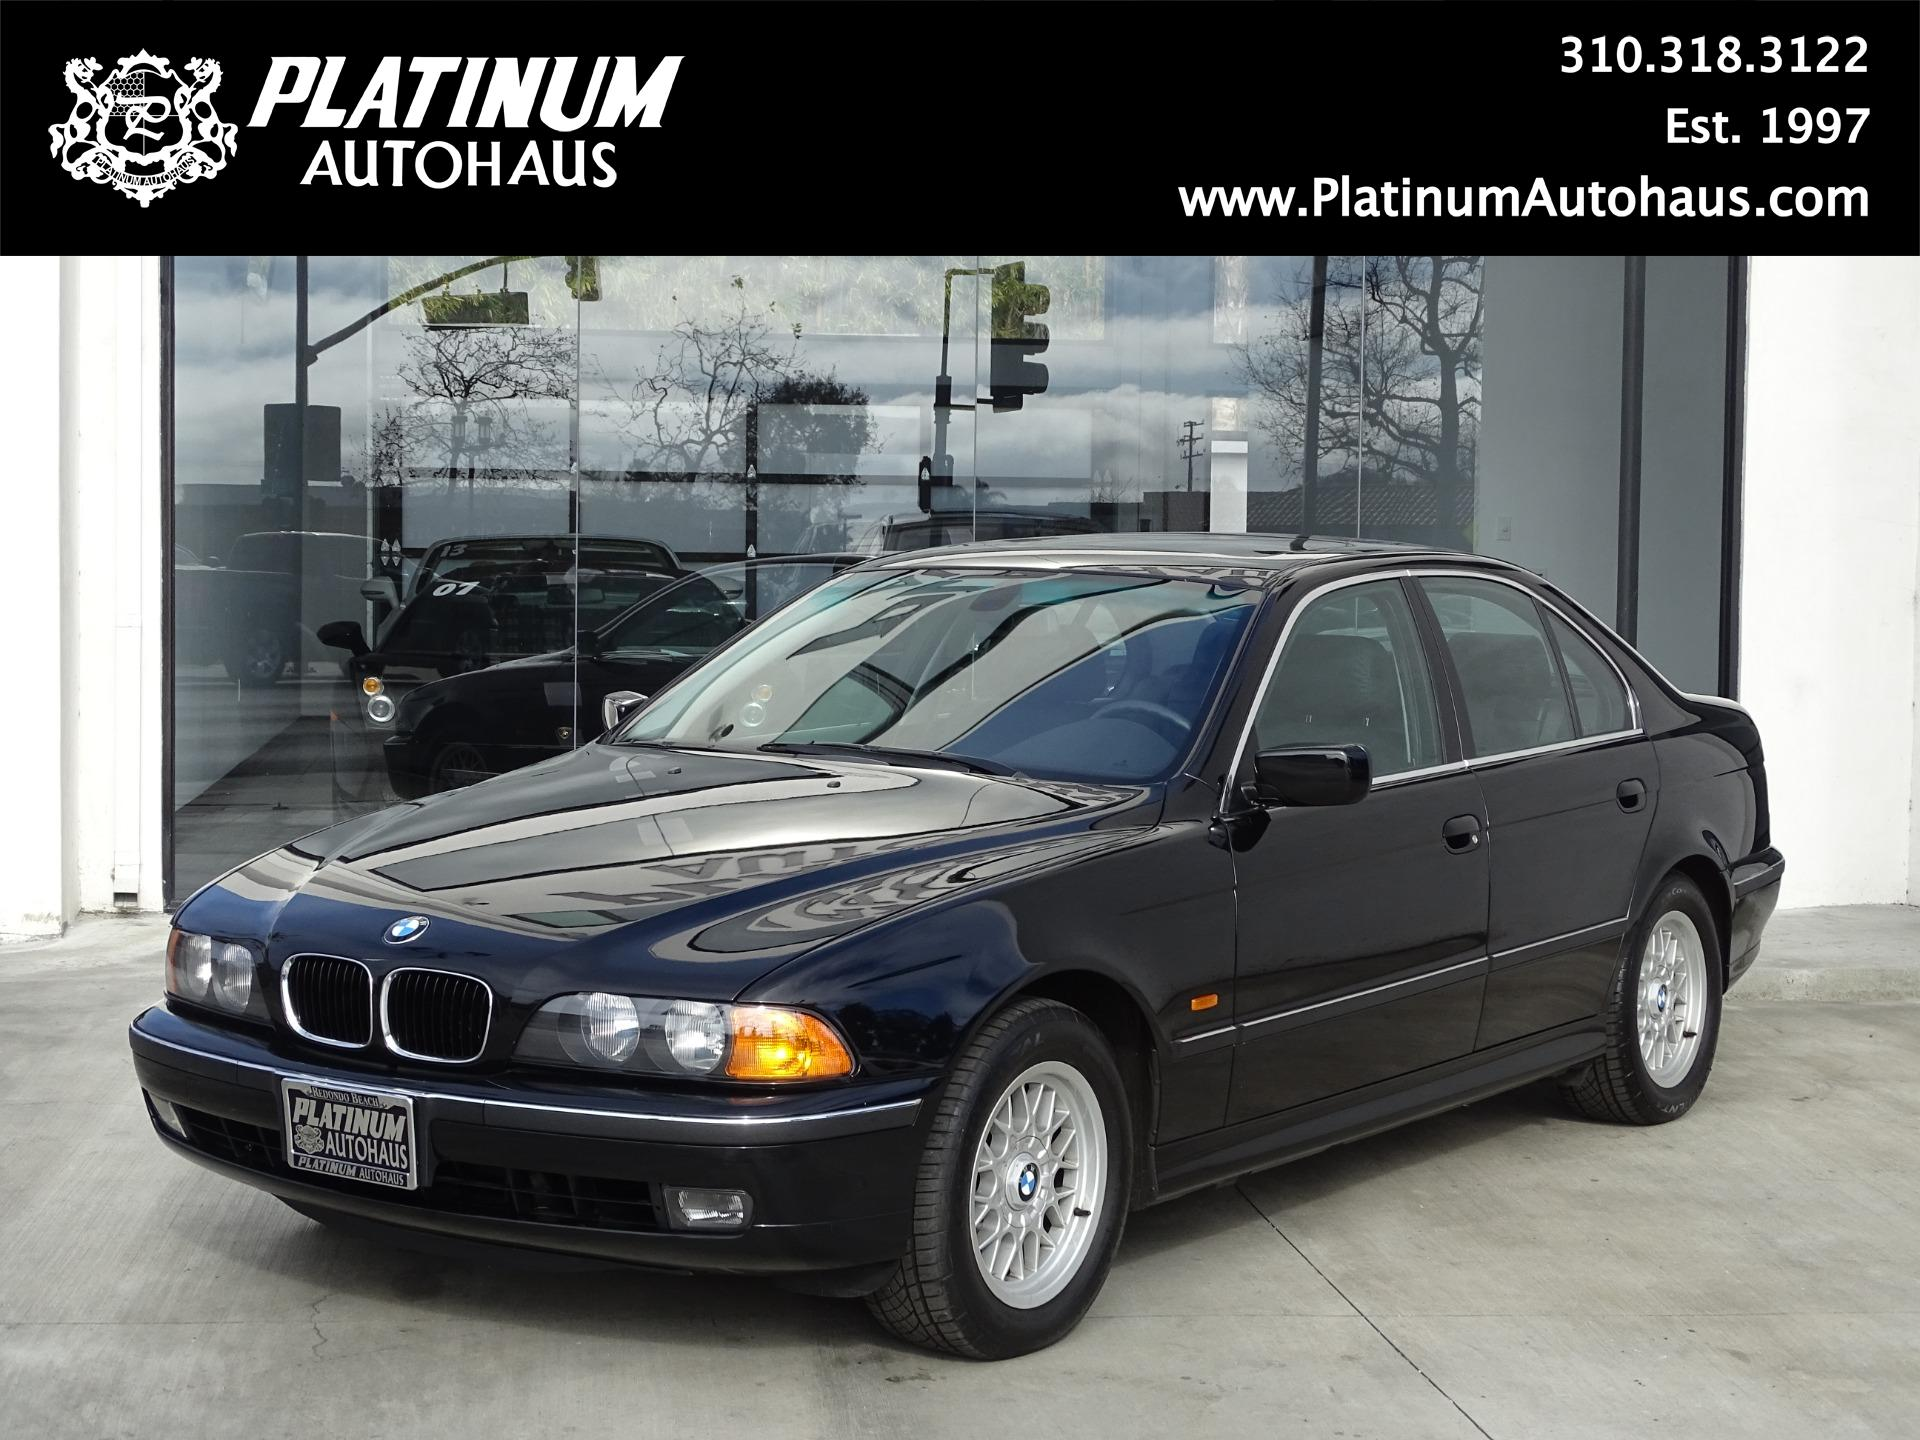 2000 Bmw 5 Series 528i Stock 6392 For Sale Near Redondo Beach Ca Ca Bmw Dealer